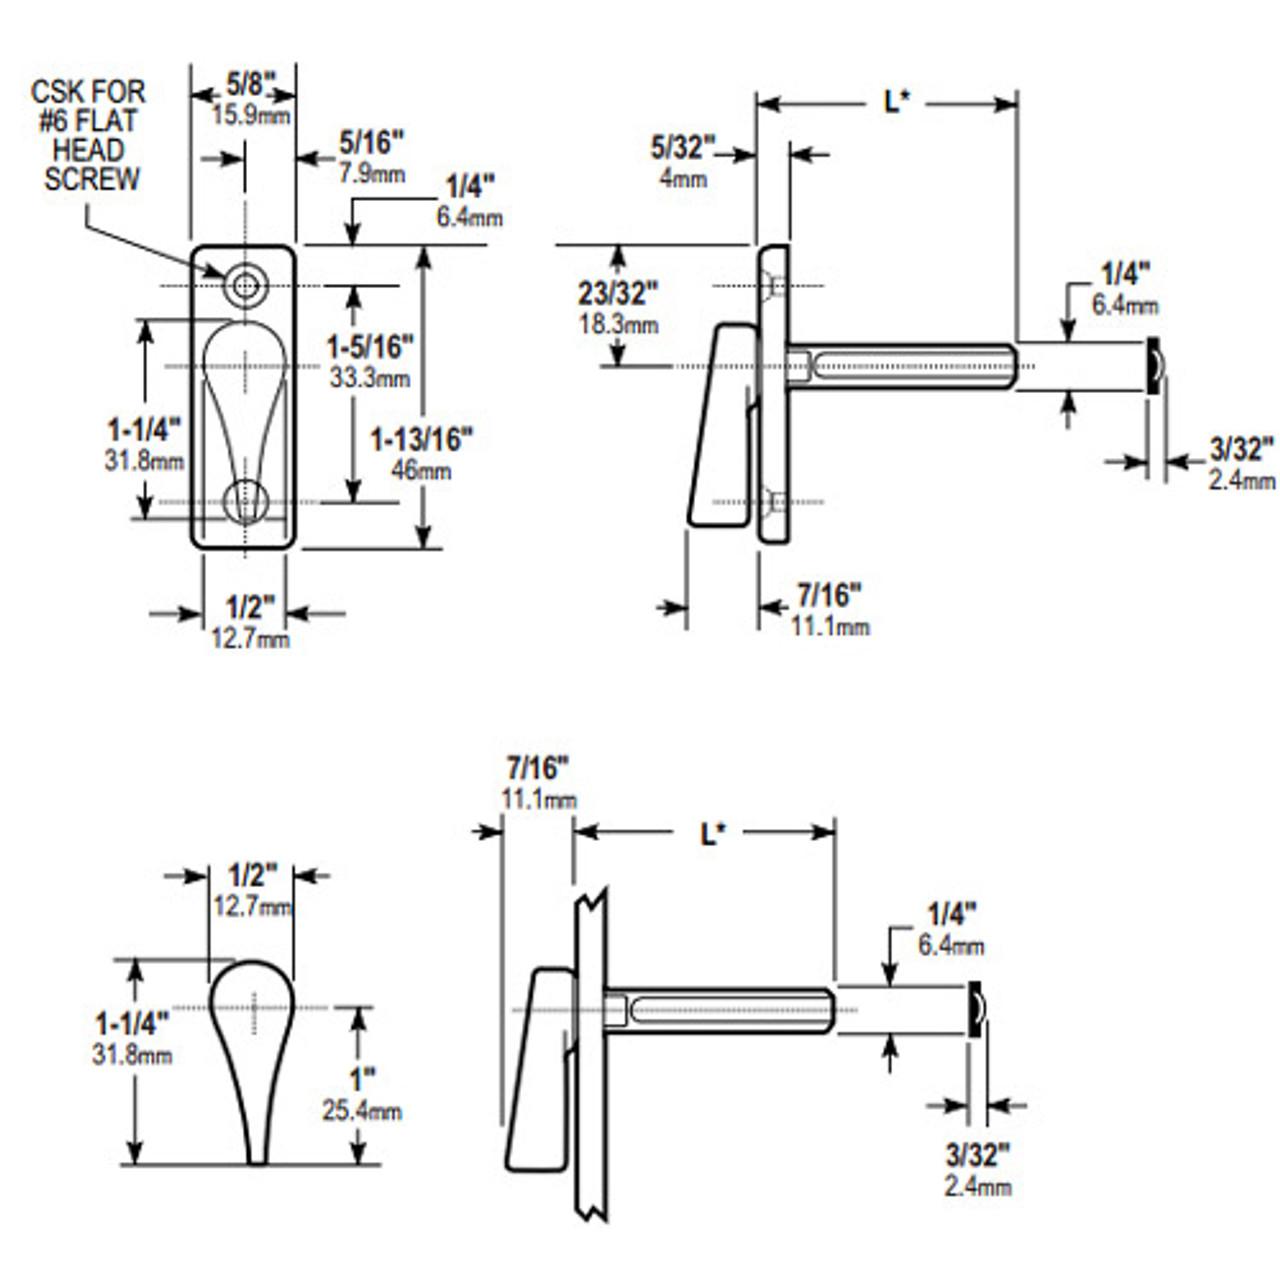 1000-21-27-130 Adams Rite 1000 Series Turns Dimensional View